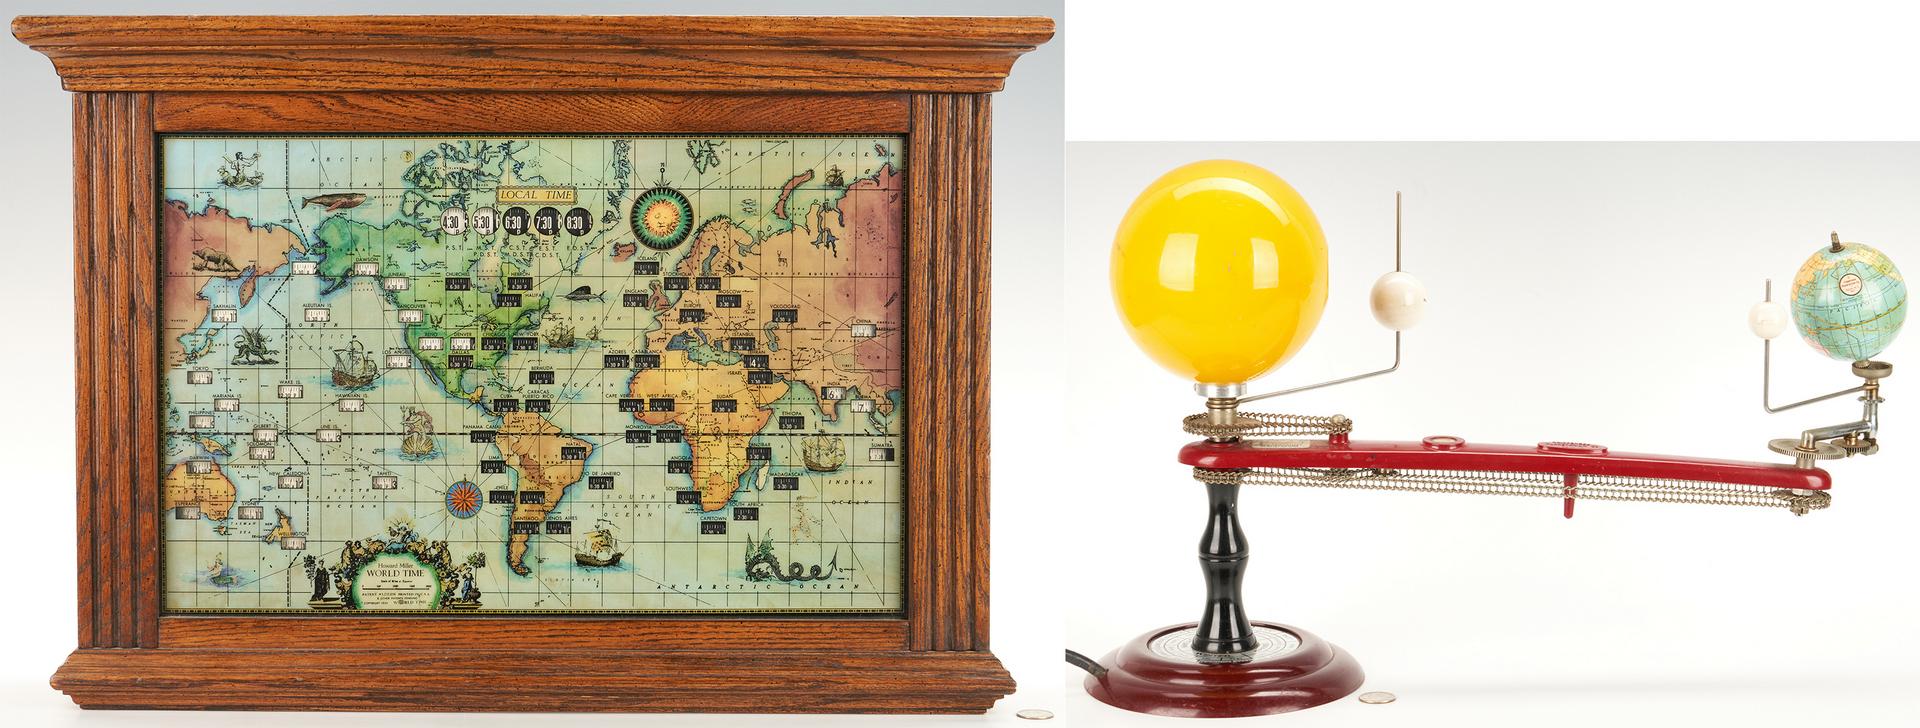 Lot 634: Trippensee Planetarium Co. Tellurian Model + Howard Miller World Map